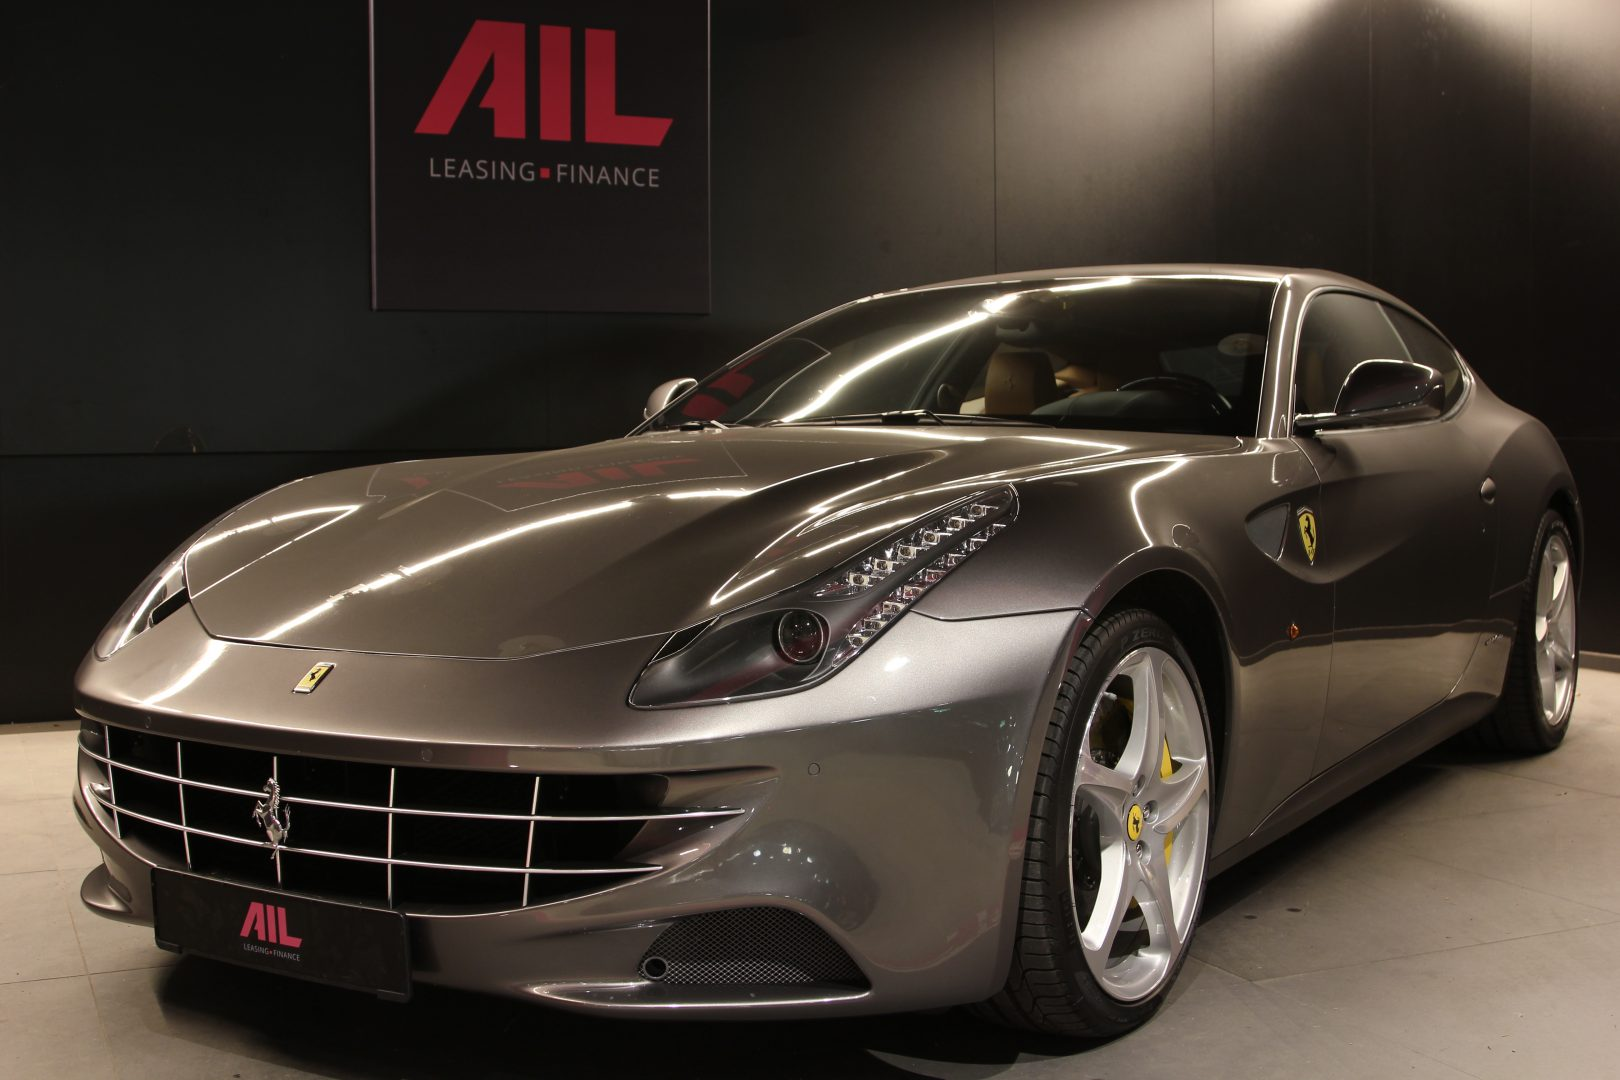 AIL Ferrari FF Grigio Lift Carbon-Paket  12